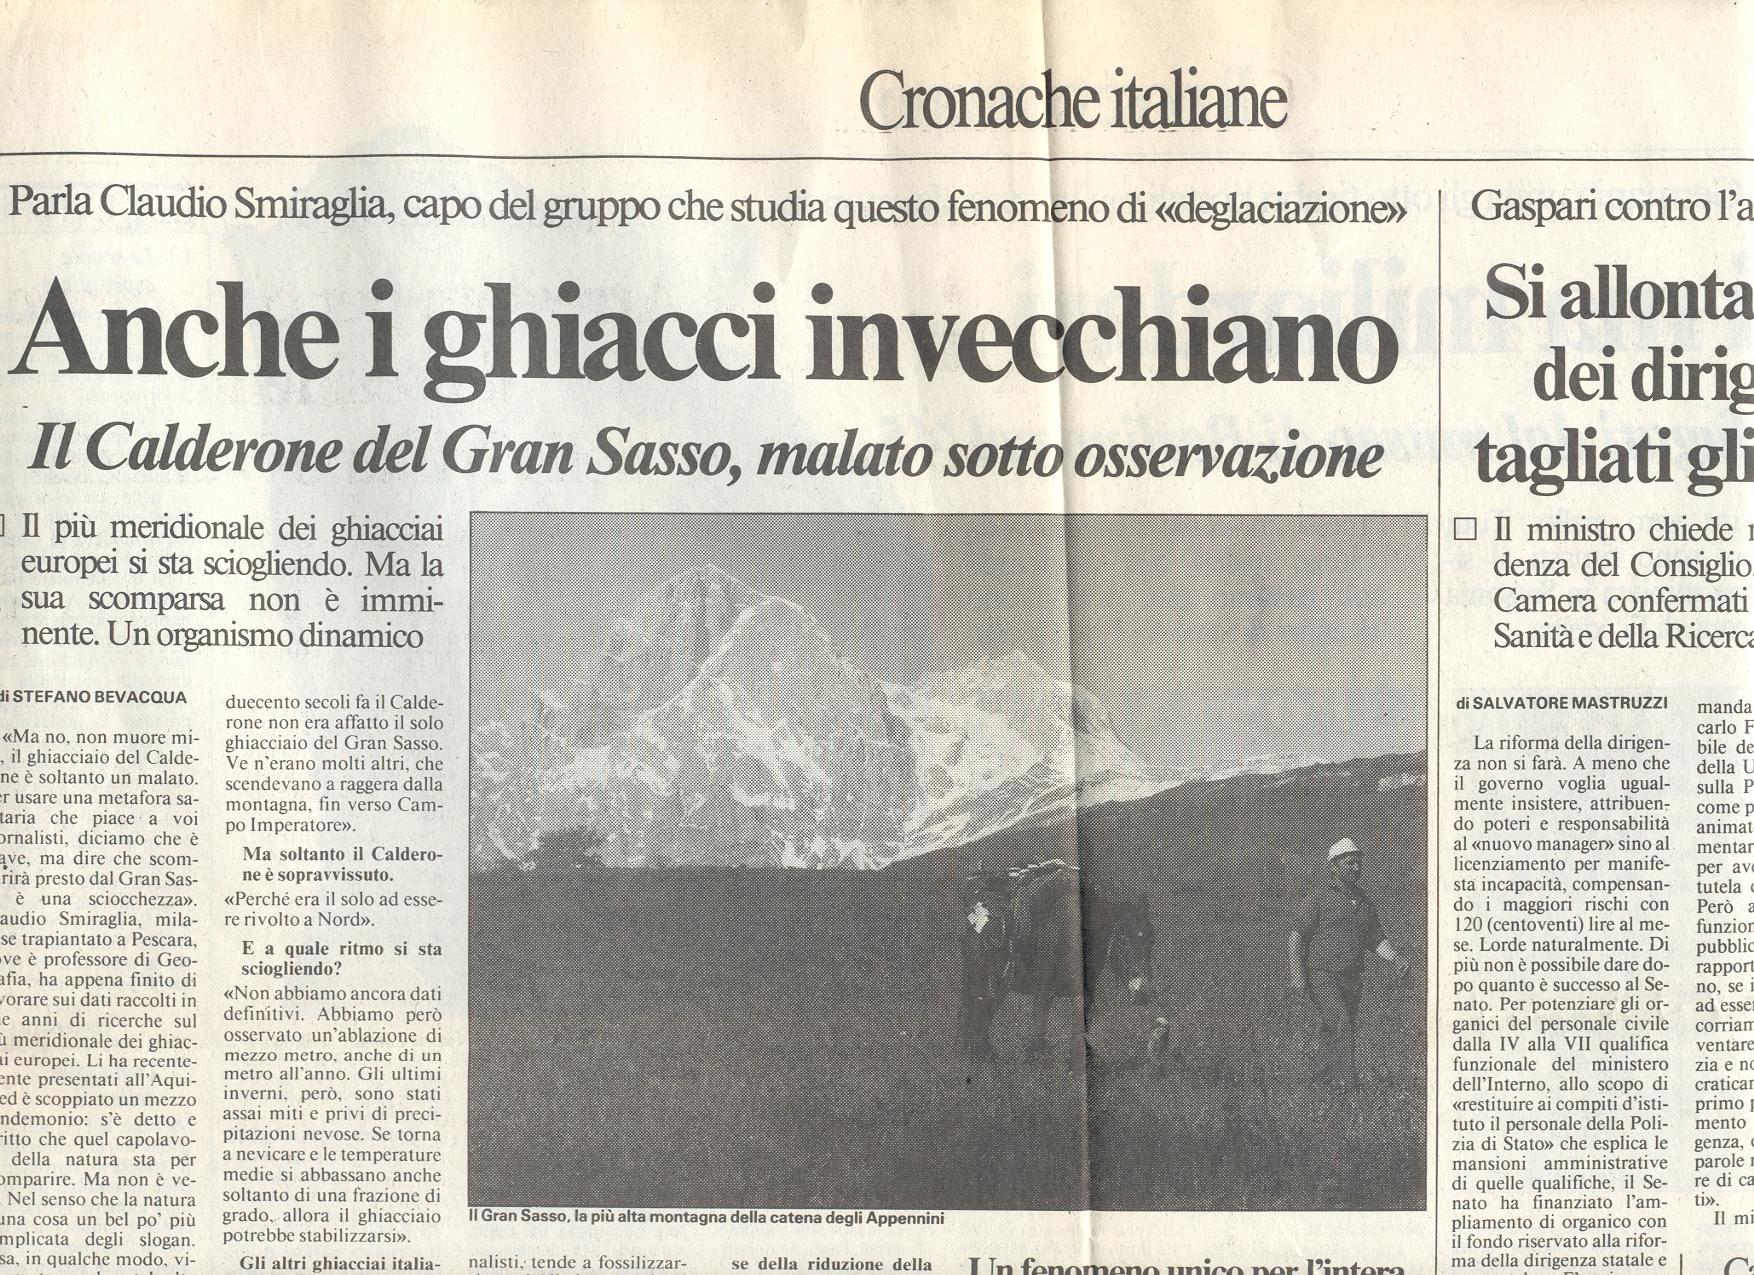 Ghiacciaio del Calderone in agonia-calderone1-giovedi-25-ottobre-1990.jpg